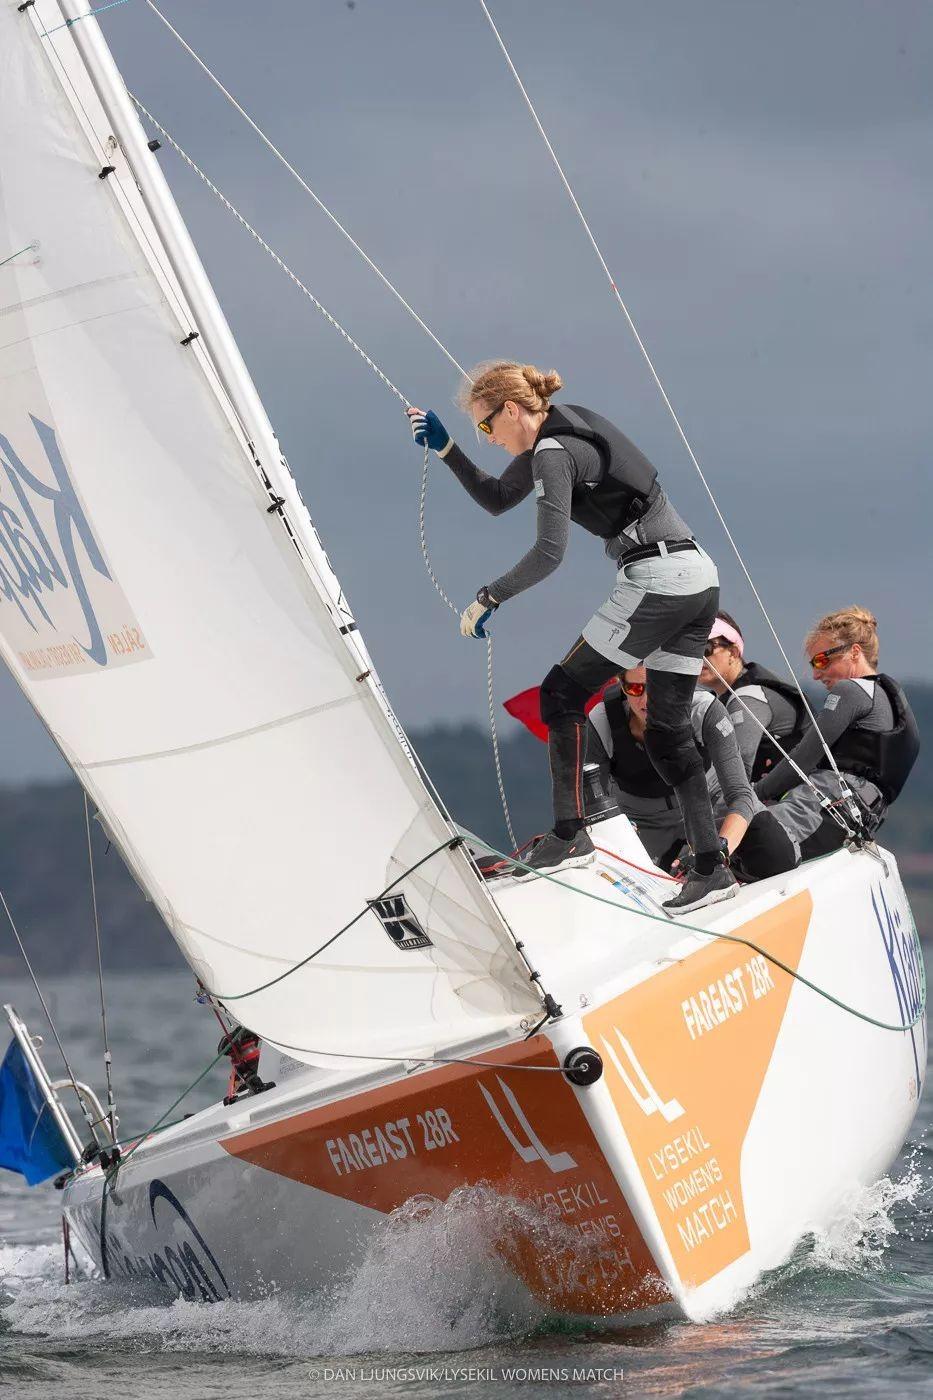 nbsp,对抗赛,28R,女子,高下 连续三年 | 珐伊28R成为顶级女子对抗赛指定用船  170154mlqfccau2ma96bfi